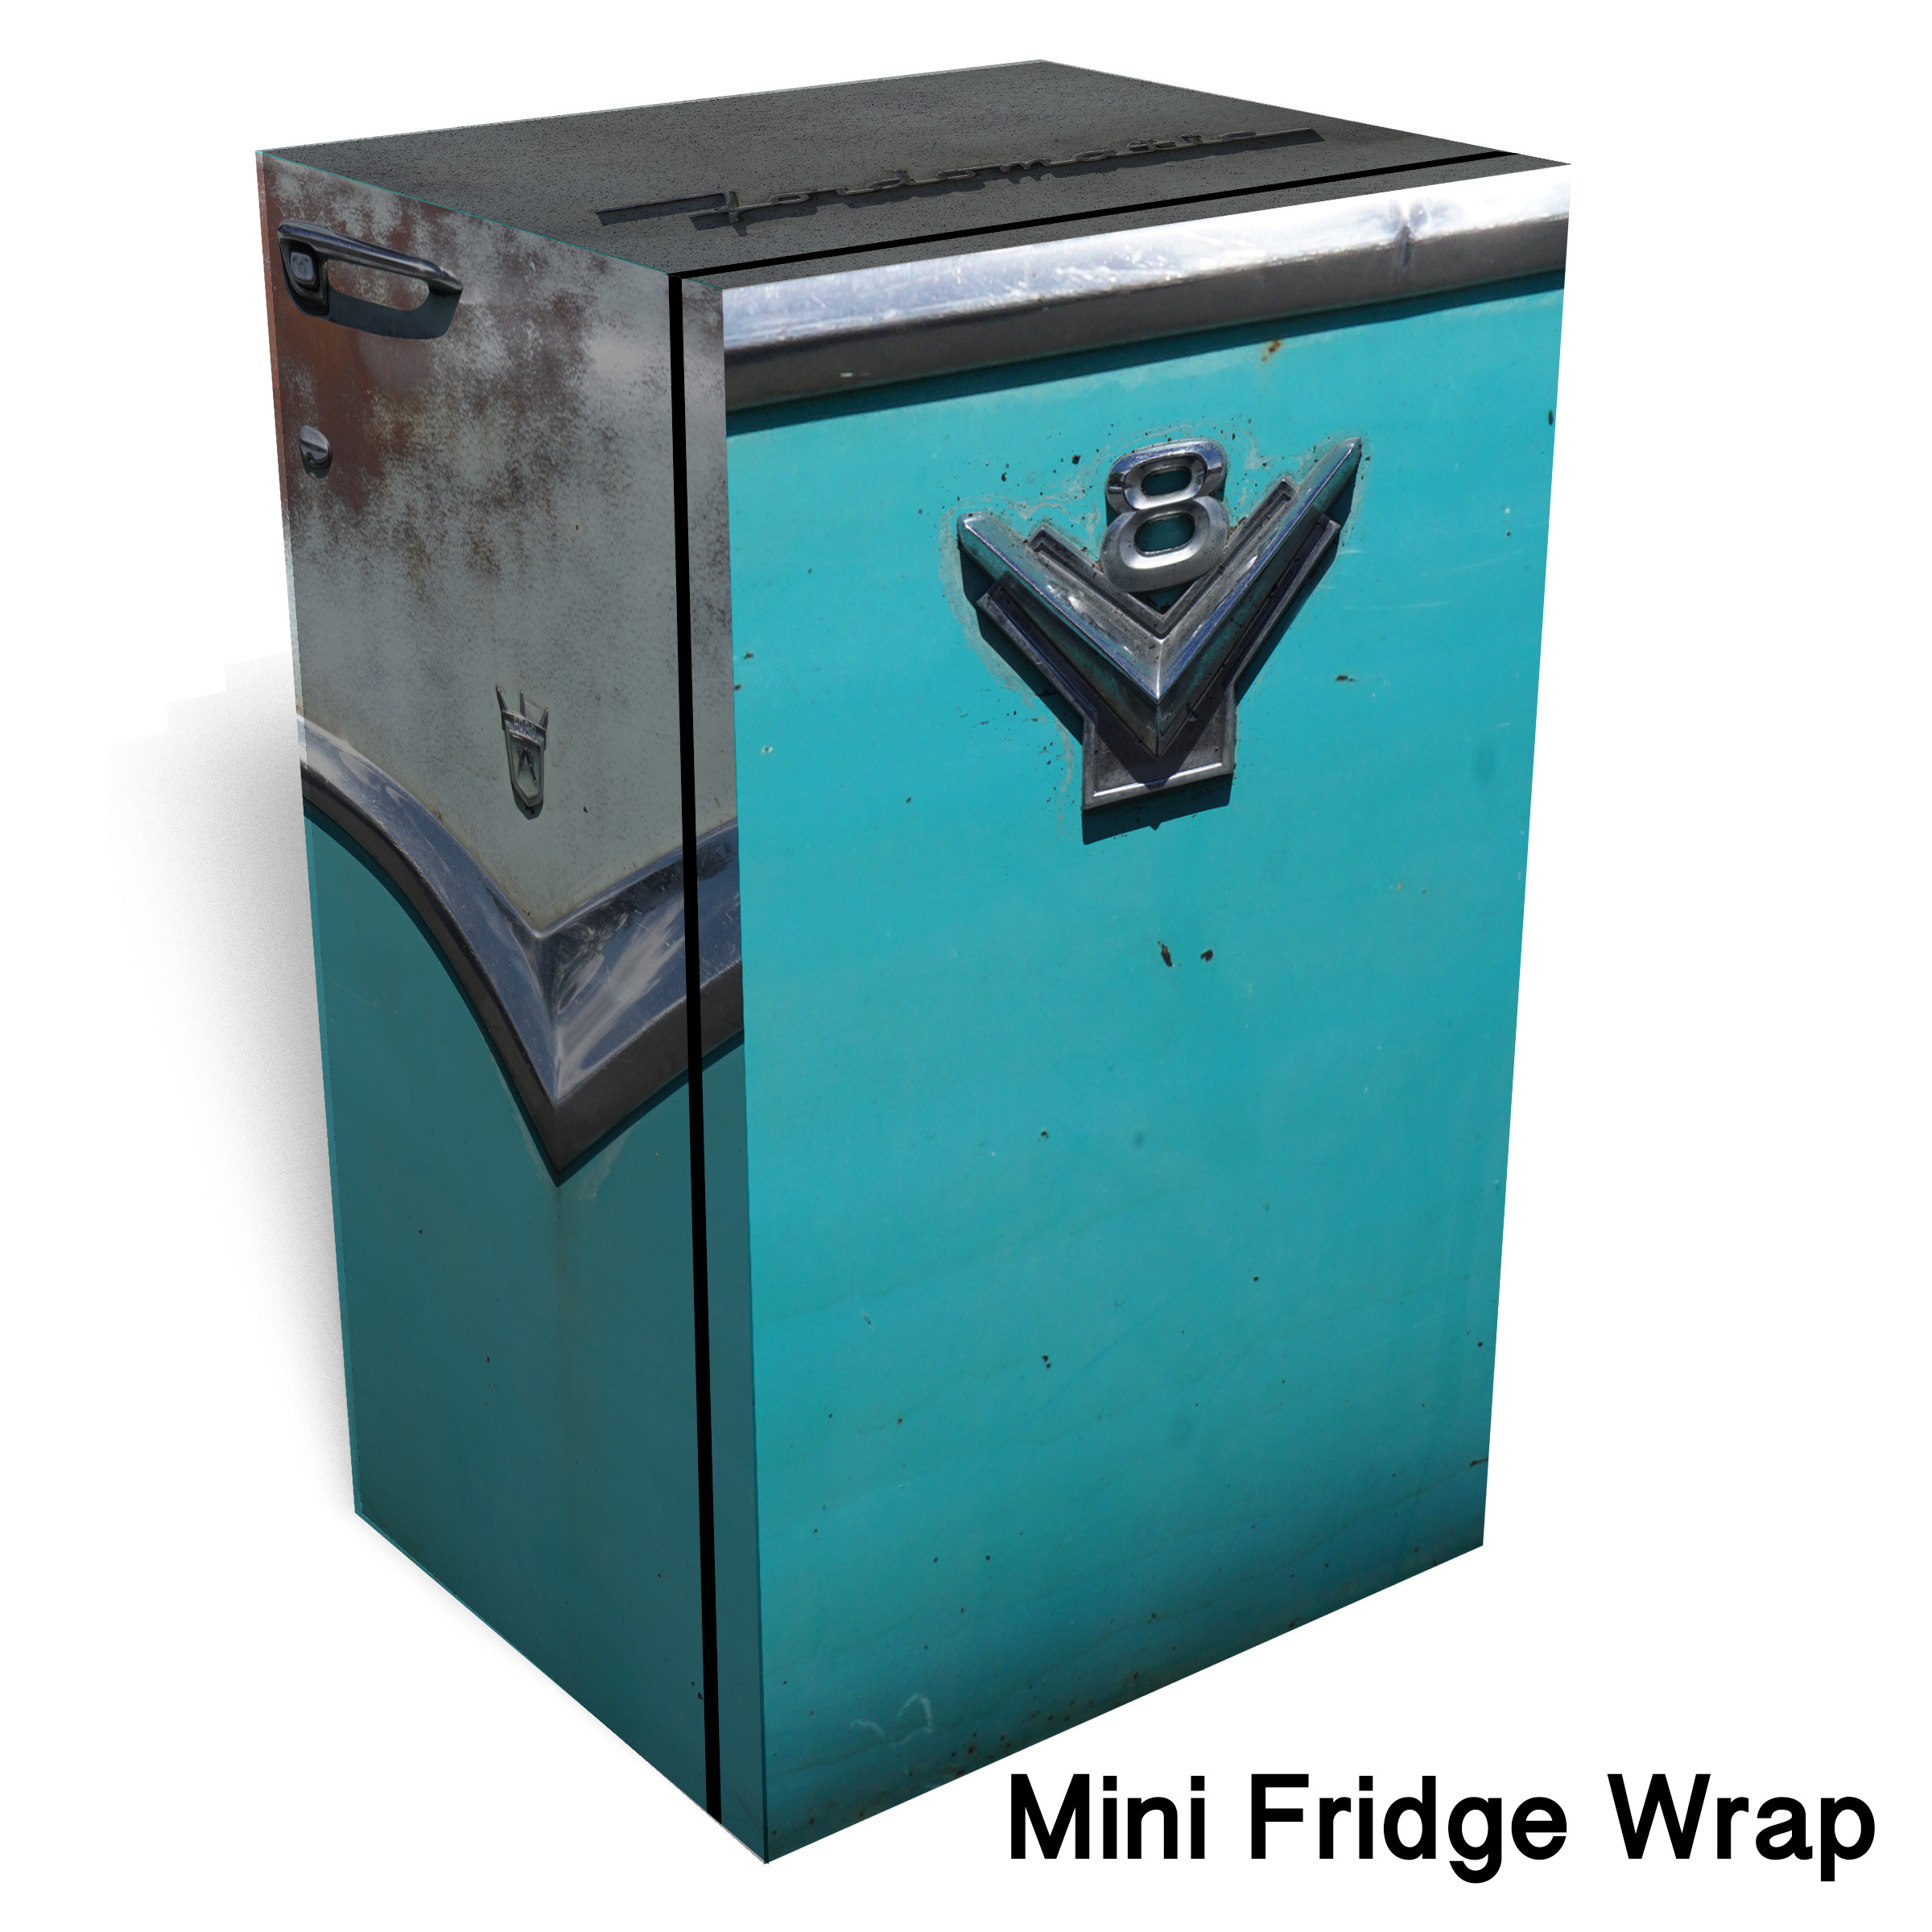 Fordomatic Mini Fridge Wrap